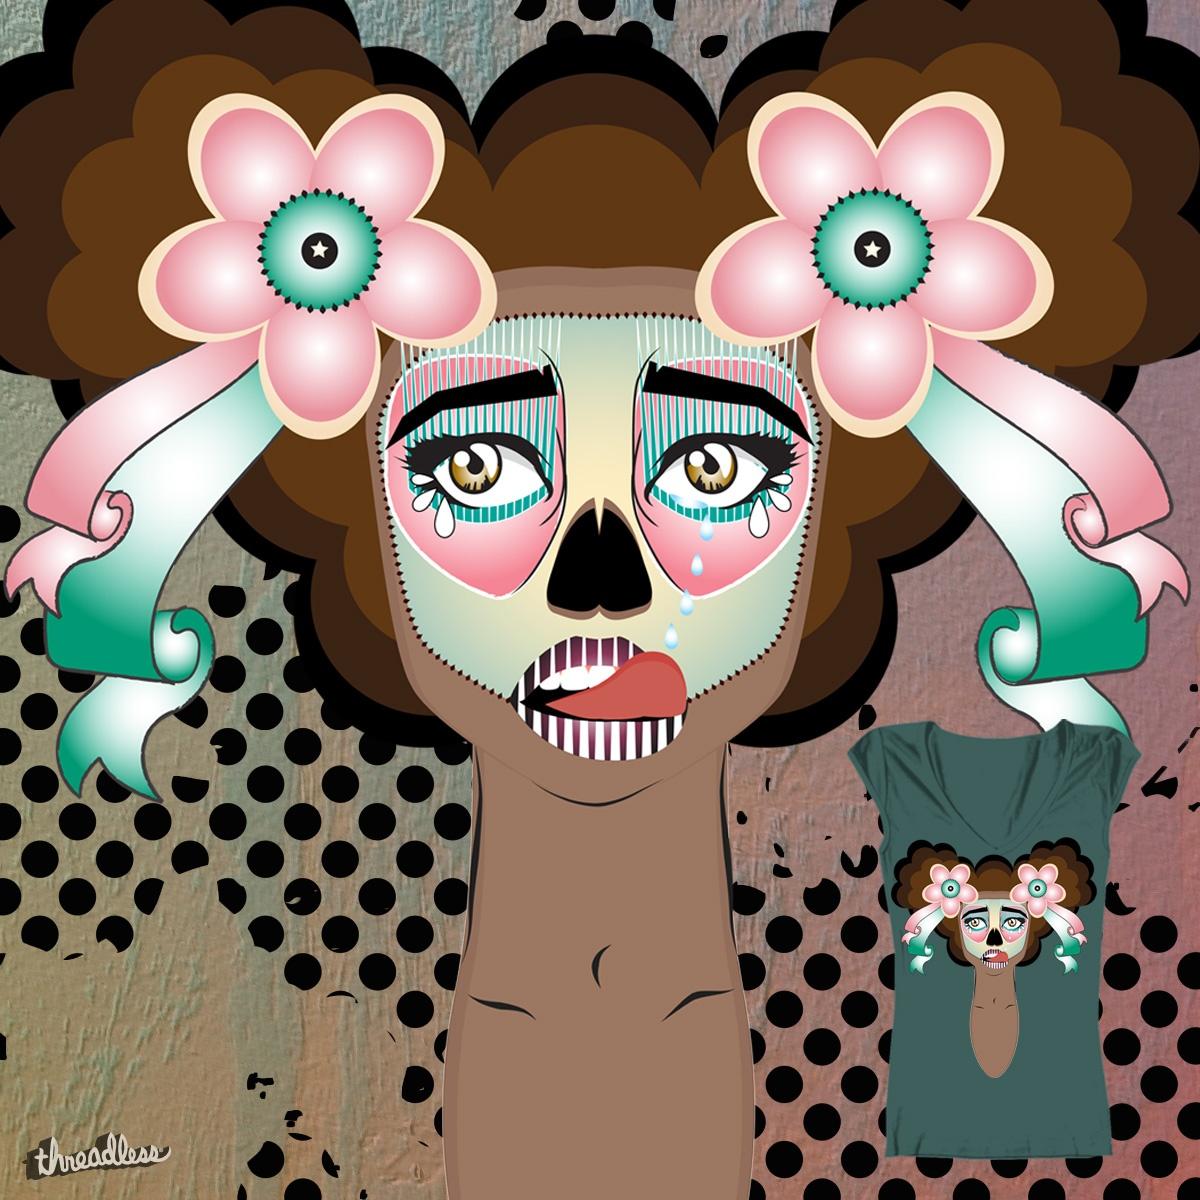 Sugar Skull Girl Candy by roro.did.onna on Threadless